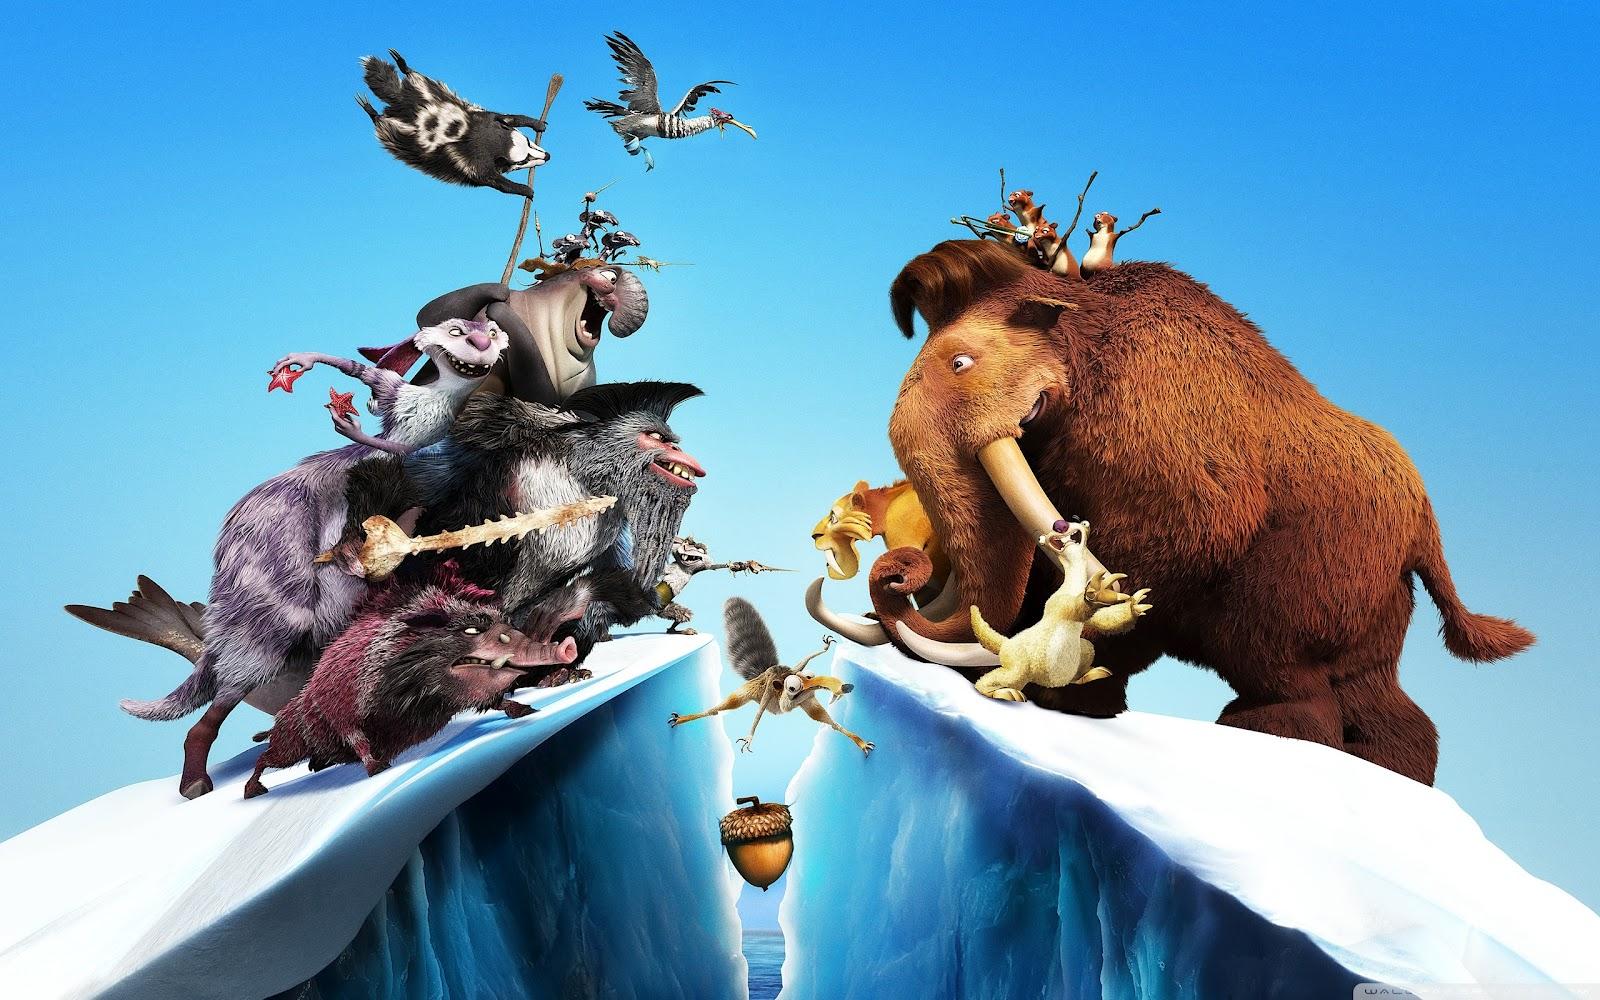 http://2.bp.blogspot.com/-3QbpyHsb__M/UBeZyK-4SDI/AAAAAAAAABI/NO36Wh1IzRU/s1600/Ice-Age-Continental-Drift-Arctic-Games.jpg